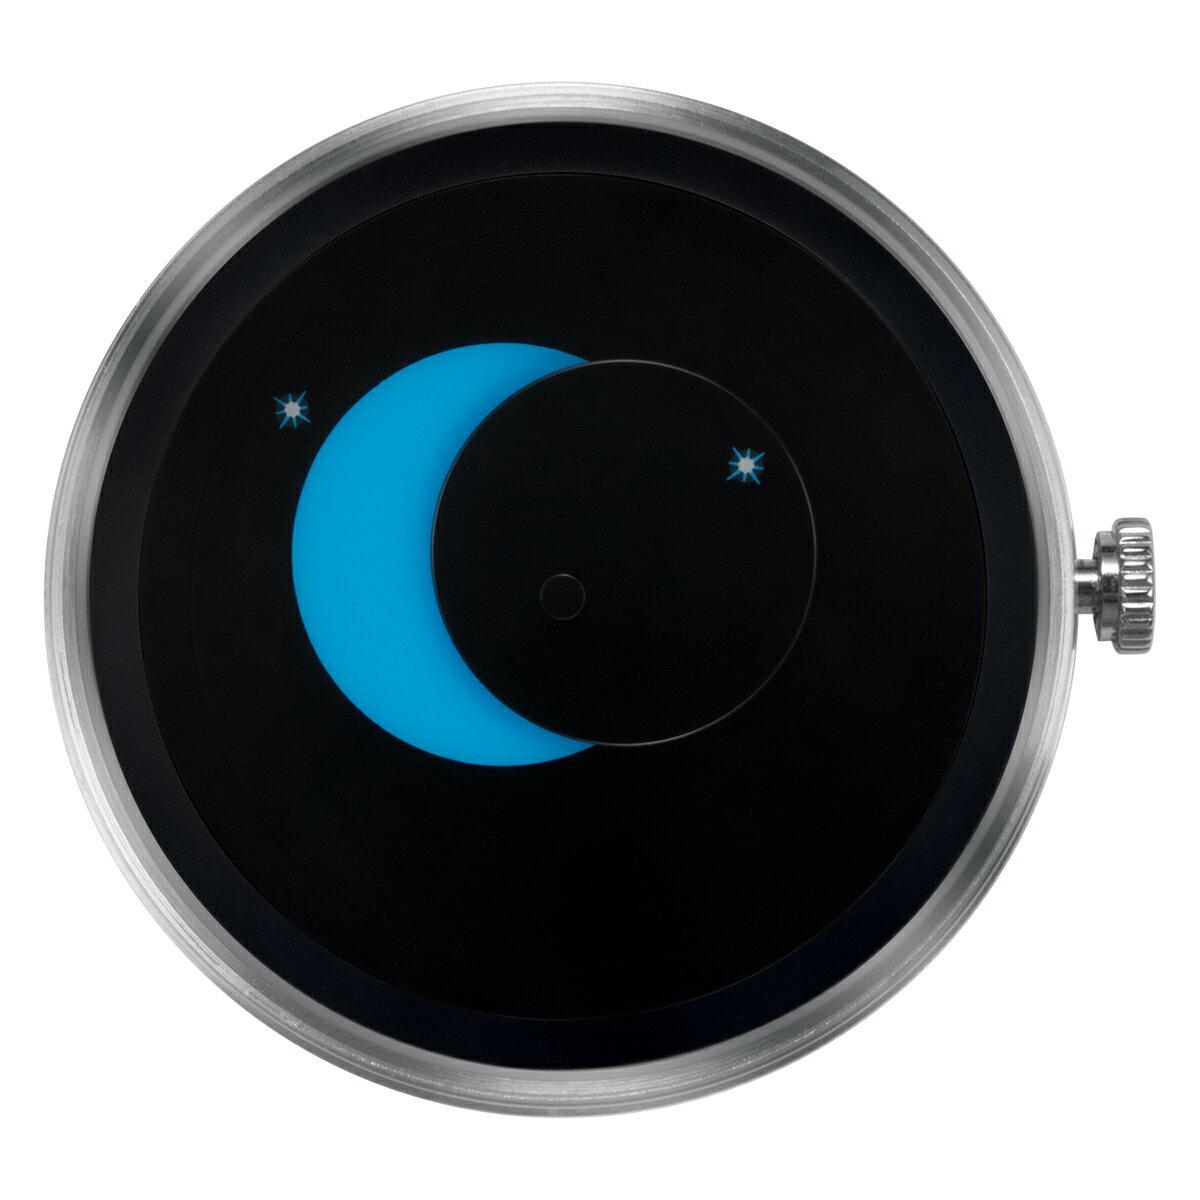 ZEROO 交換用クロックボディ ZEROO SUPER MOON ゼロ 電池式クォーツ 腕時計 [M02006]